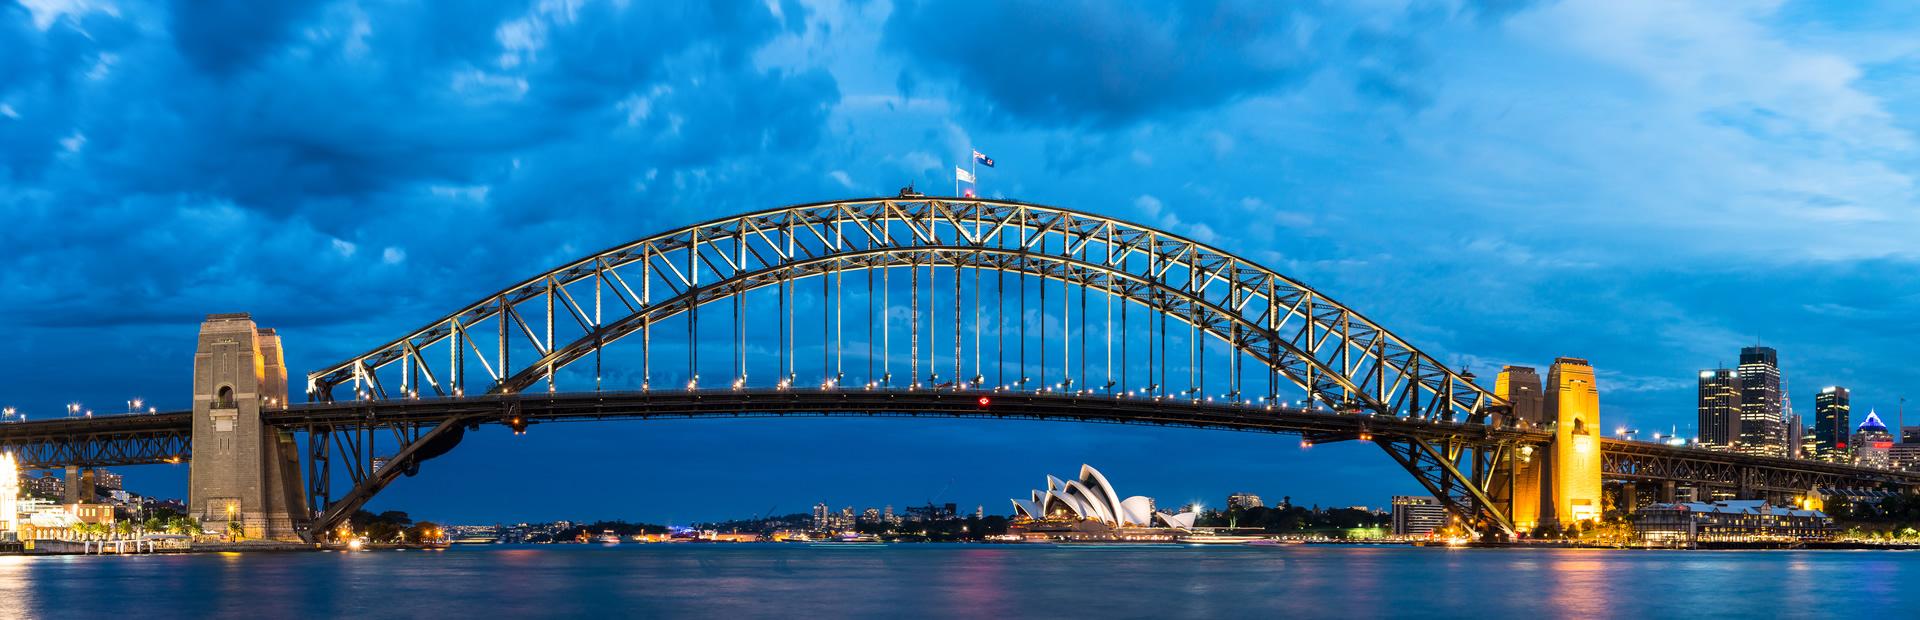 Sydney Harbour Bridge nib Non resident travel insurance 247